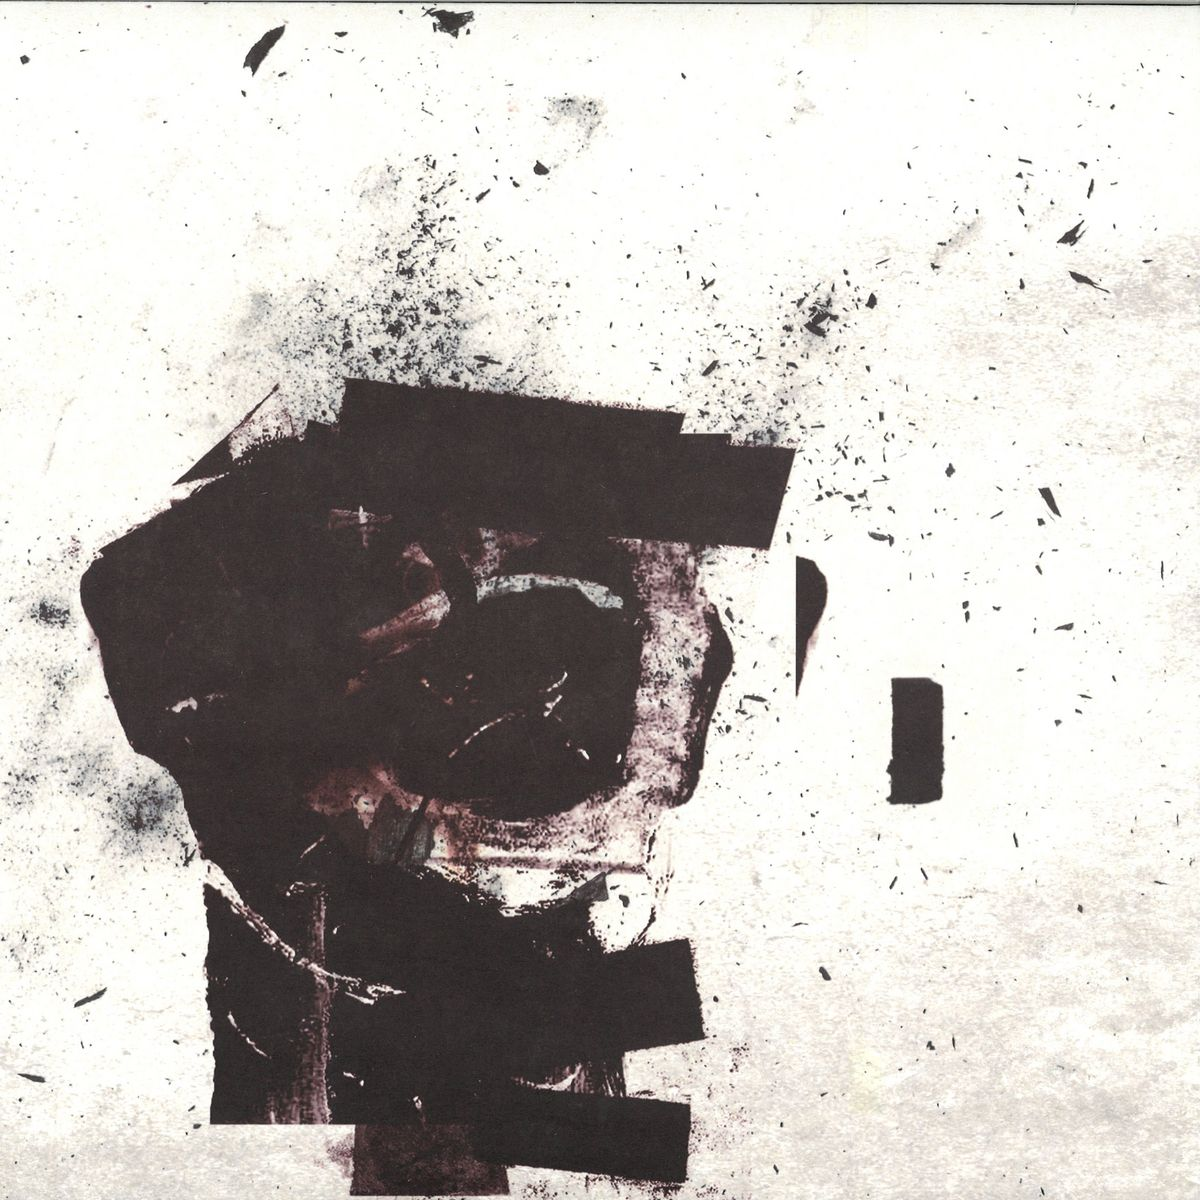 Charlotte De Witte - Closer EP (Mary Go Wild Black)